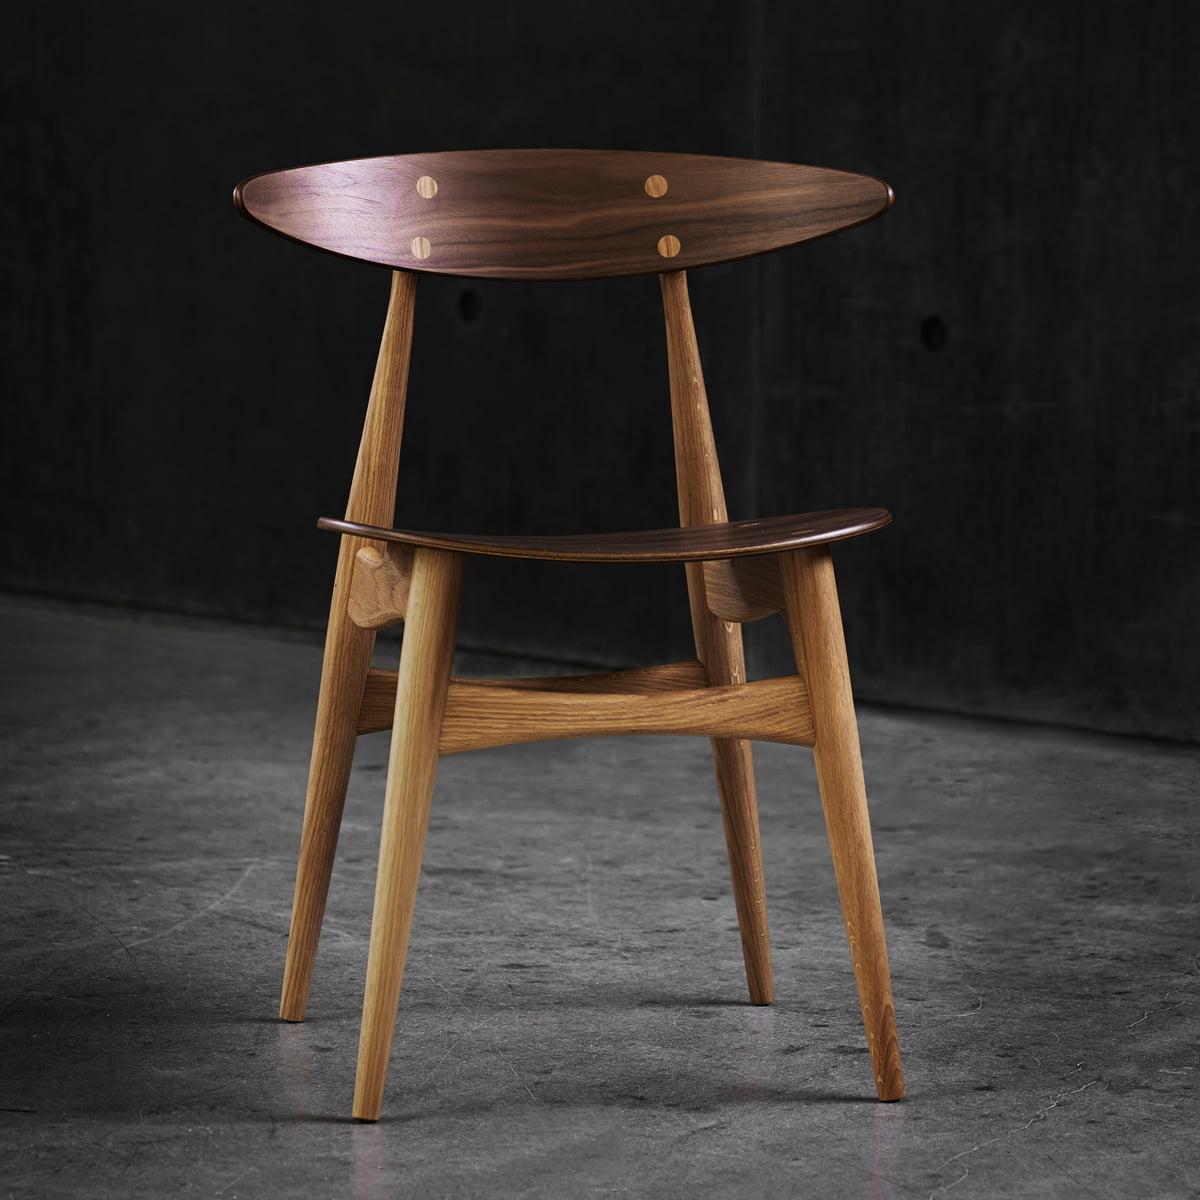 Ch33 Chair By Carl Hansen In The Home Design Shop